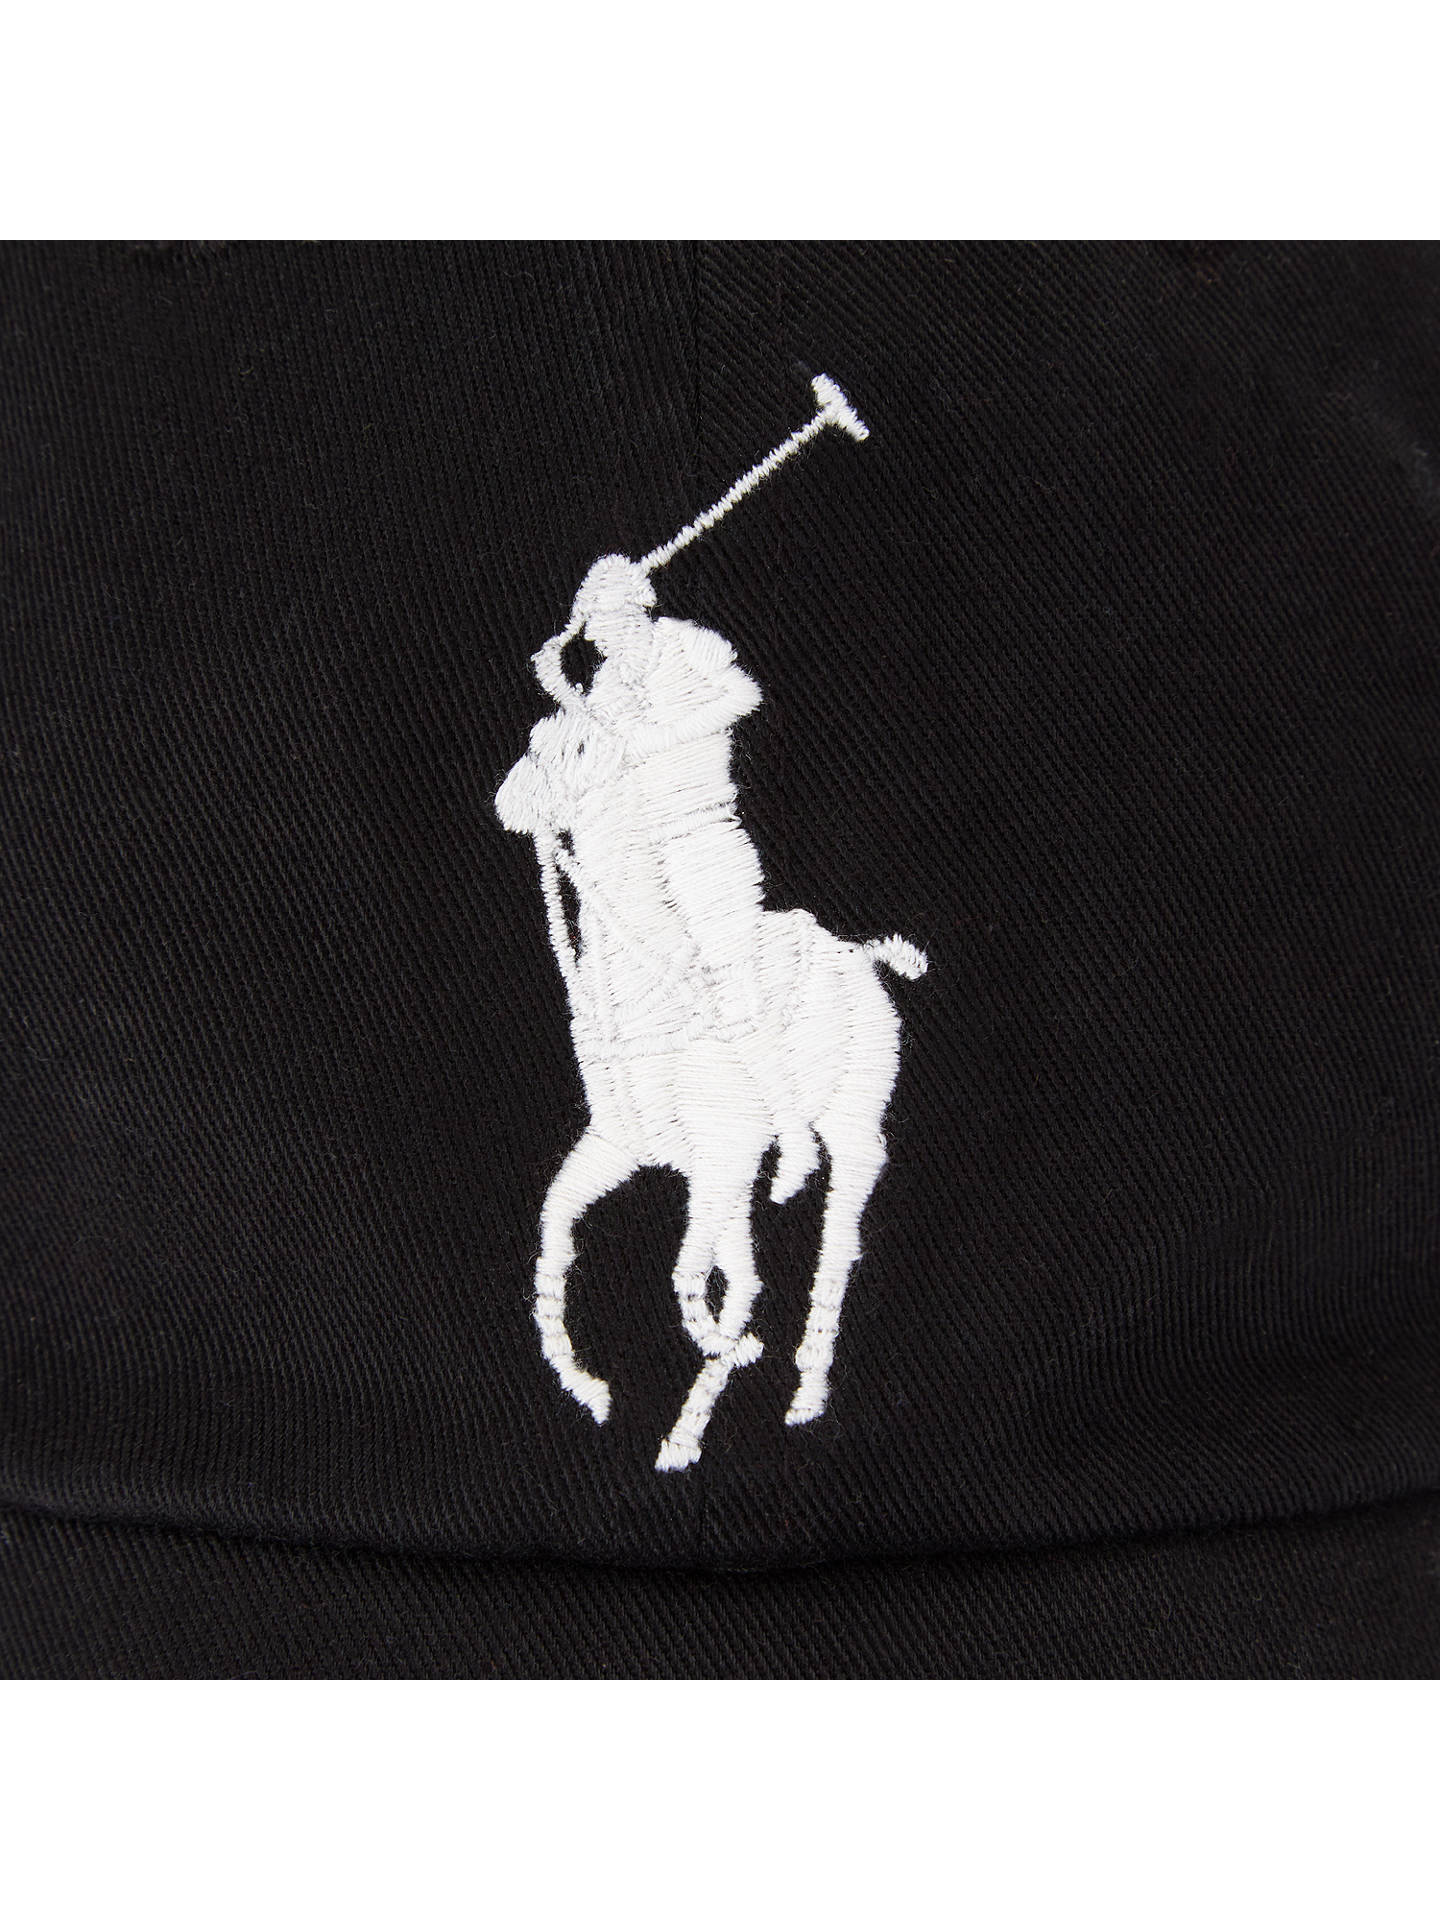 090518b669456 ... Buy Polo Ralph Lauren Big Pony Chino Baseball Cap